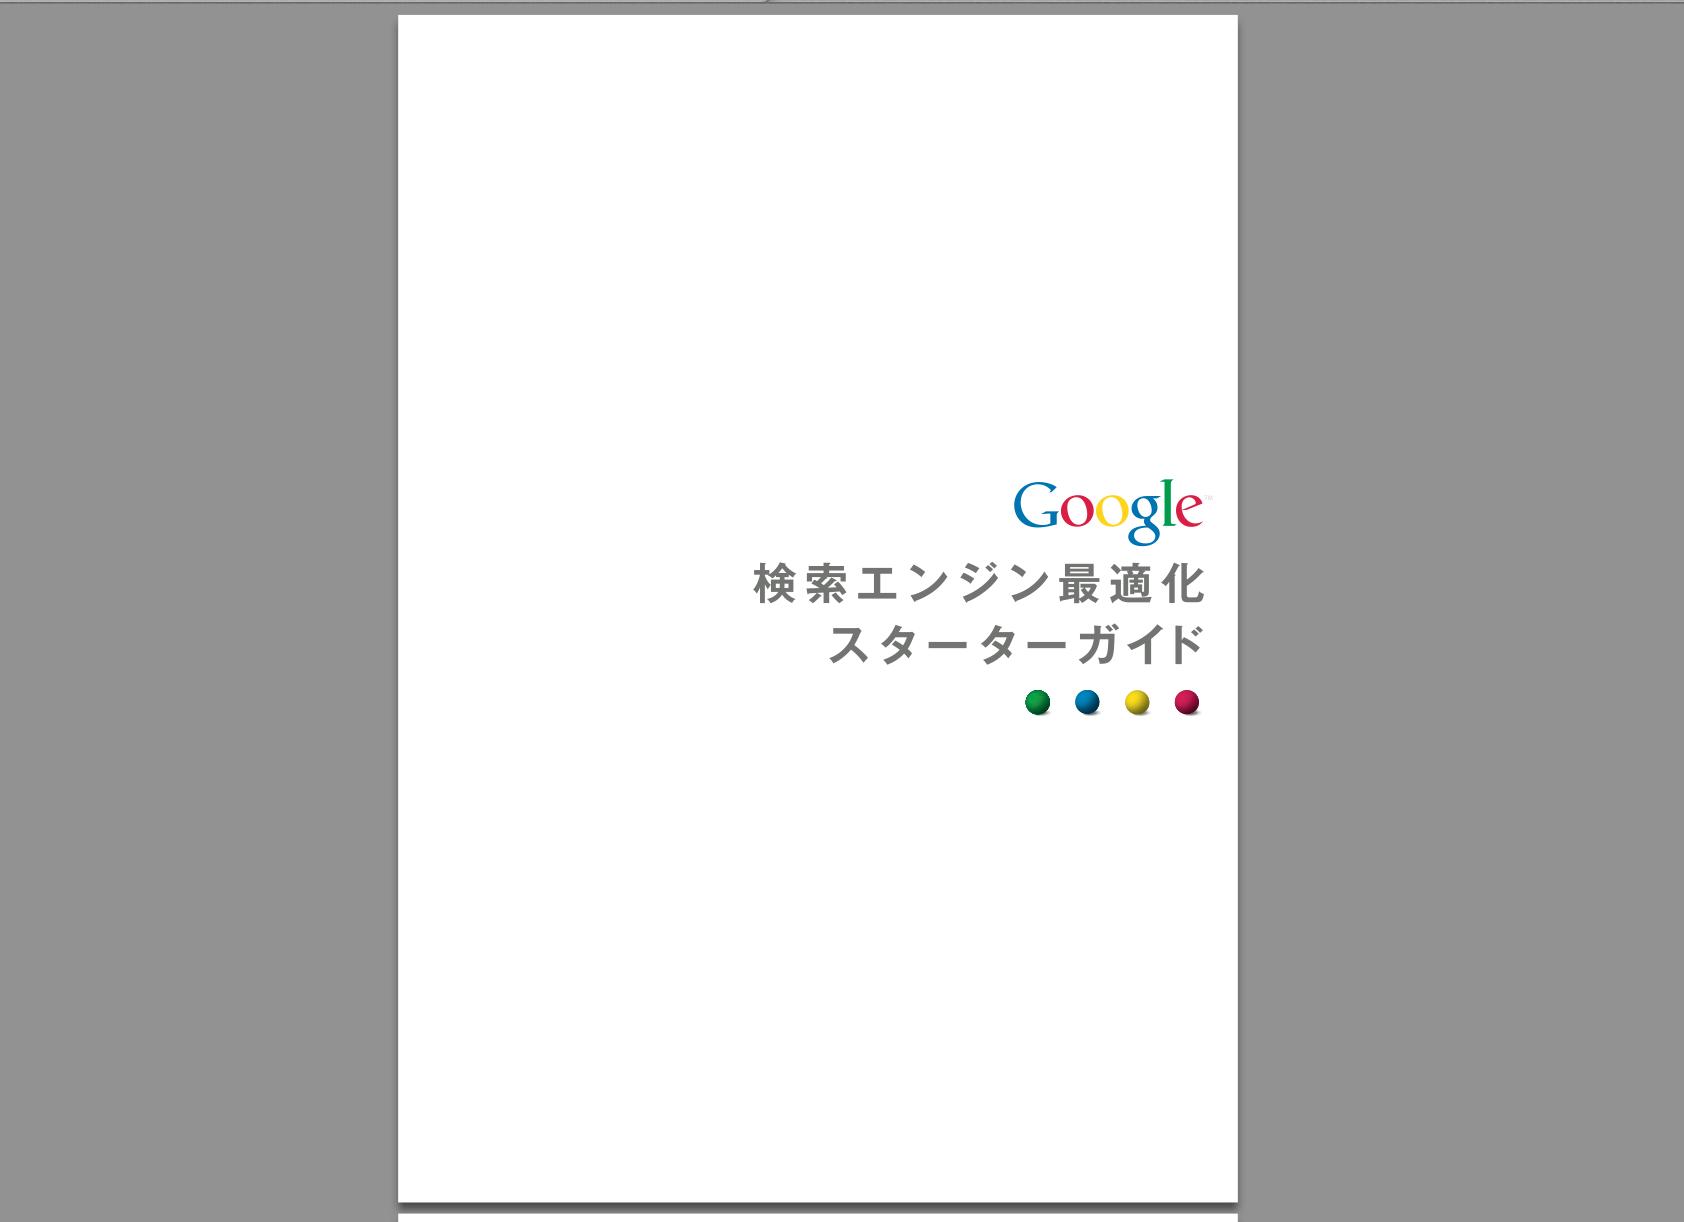 Googleの社内向けSEOガイドが公開されている件 - スリーク・トライブ